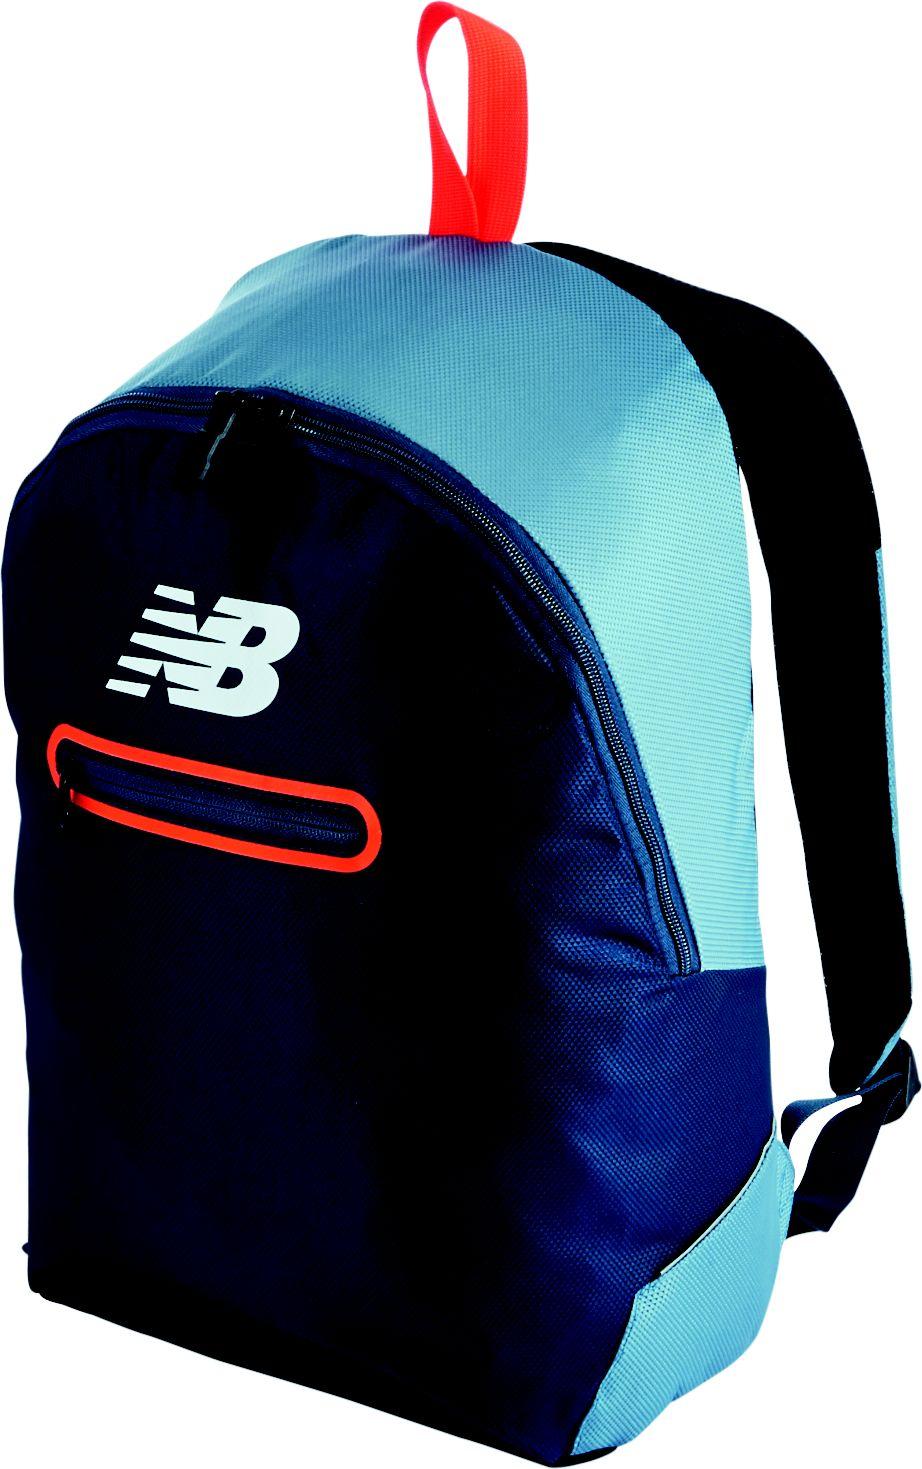 NB NB Team Backpack 2016, Typhoon